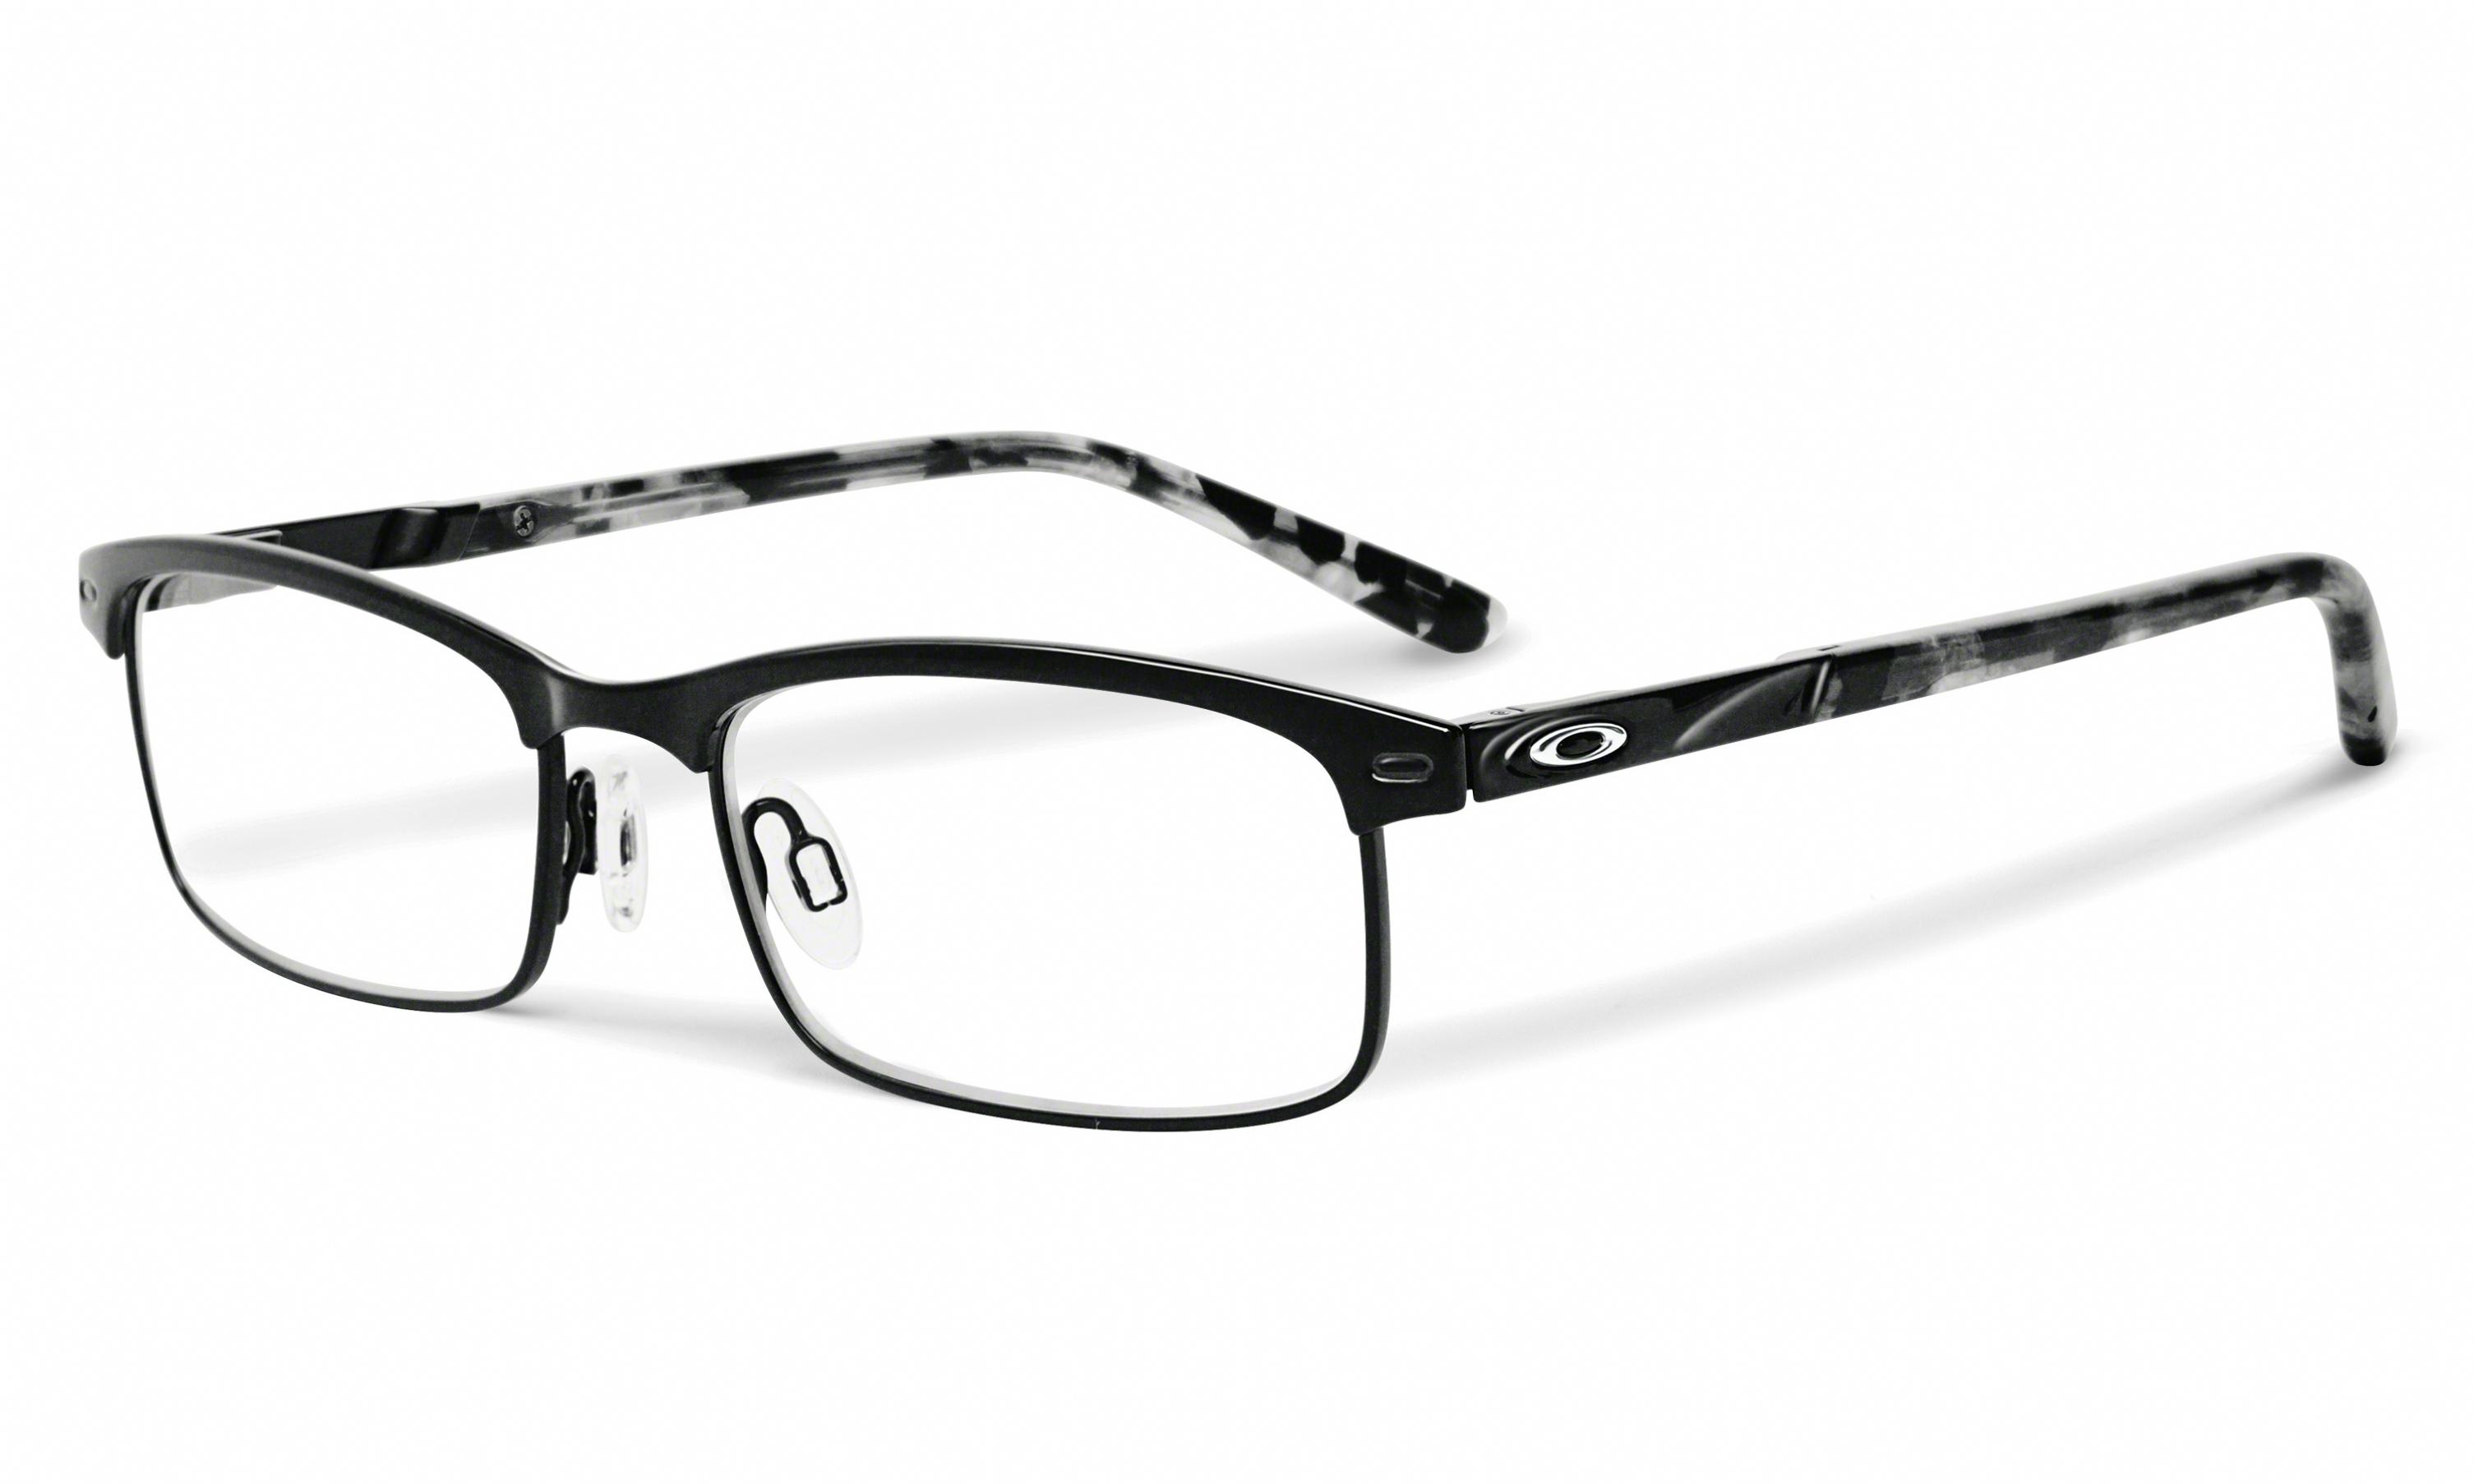 Bifocal Oakley Glasses